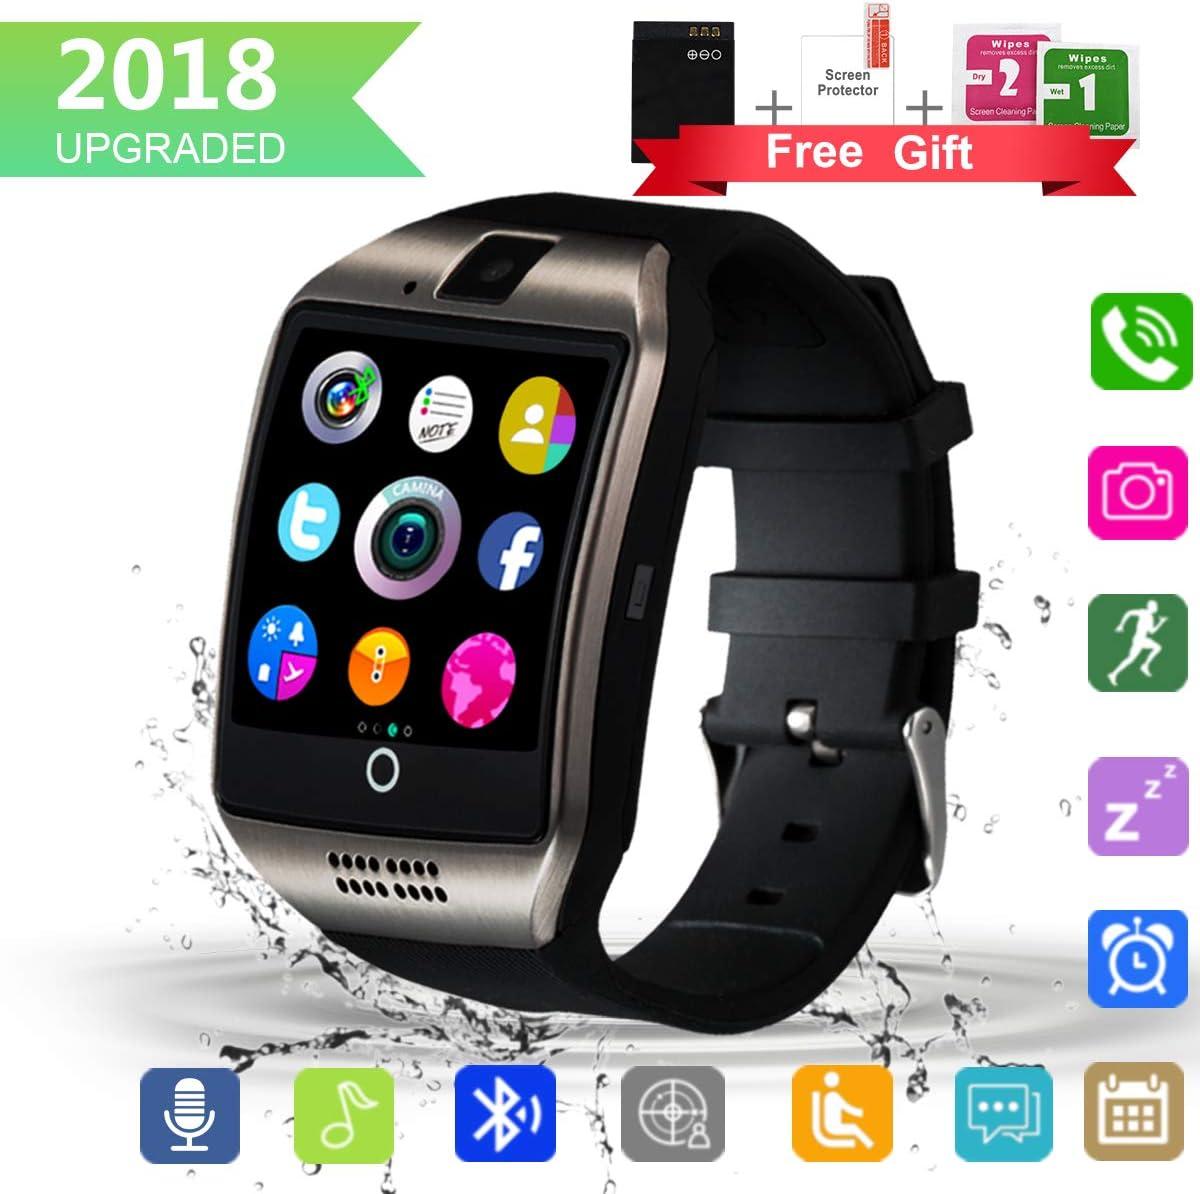 Smartwatch, Impermeable Reloj Inteligente Redondo con Sim Tarjeta Camara Whatsapp, Bluetooth Tactil Telefono Smart Watch Smartwatches para Android iOS iPhone Samsung Hombre Mujer Niño Niña